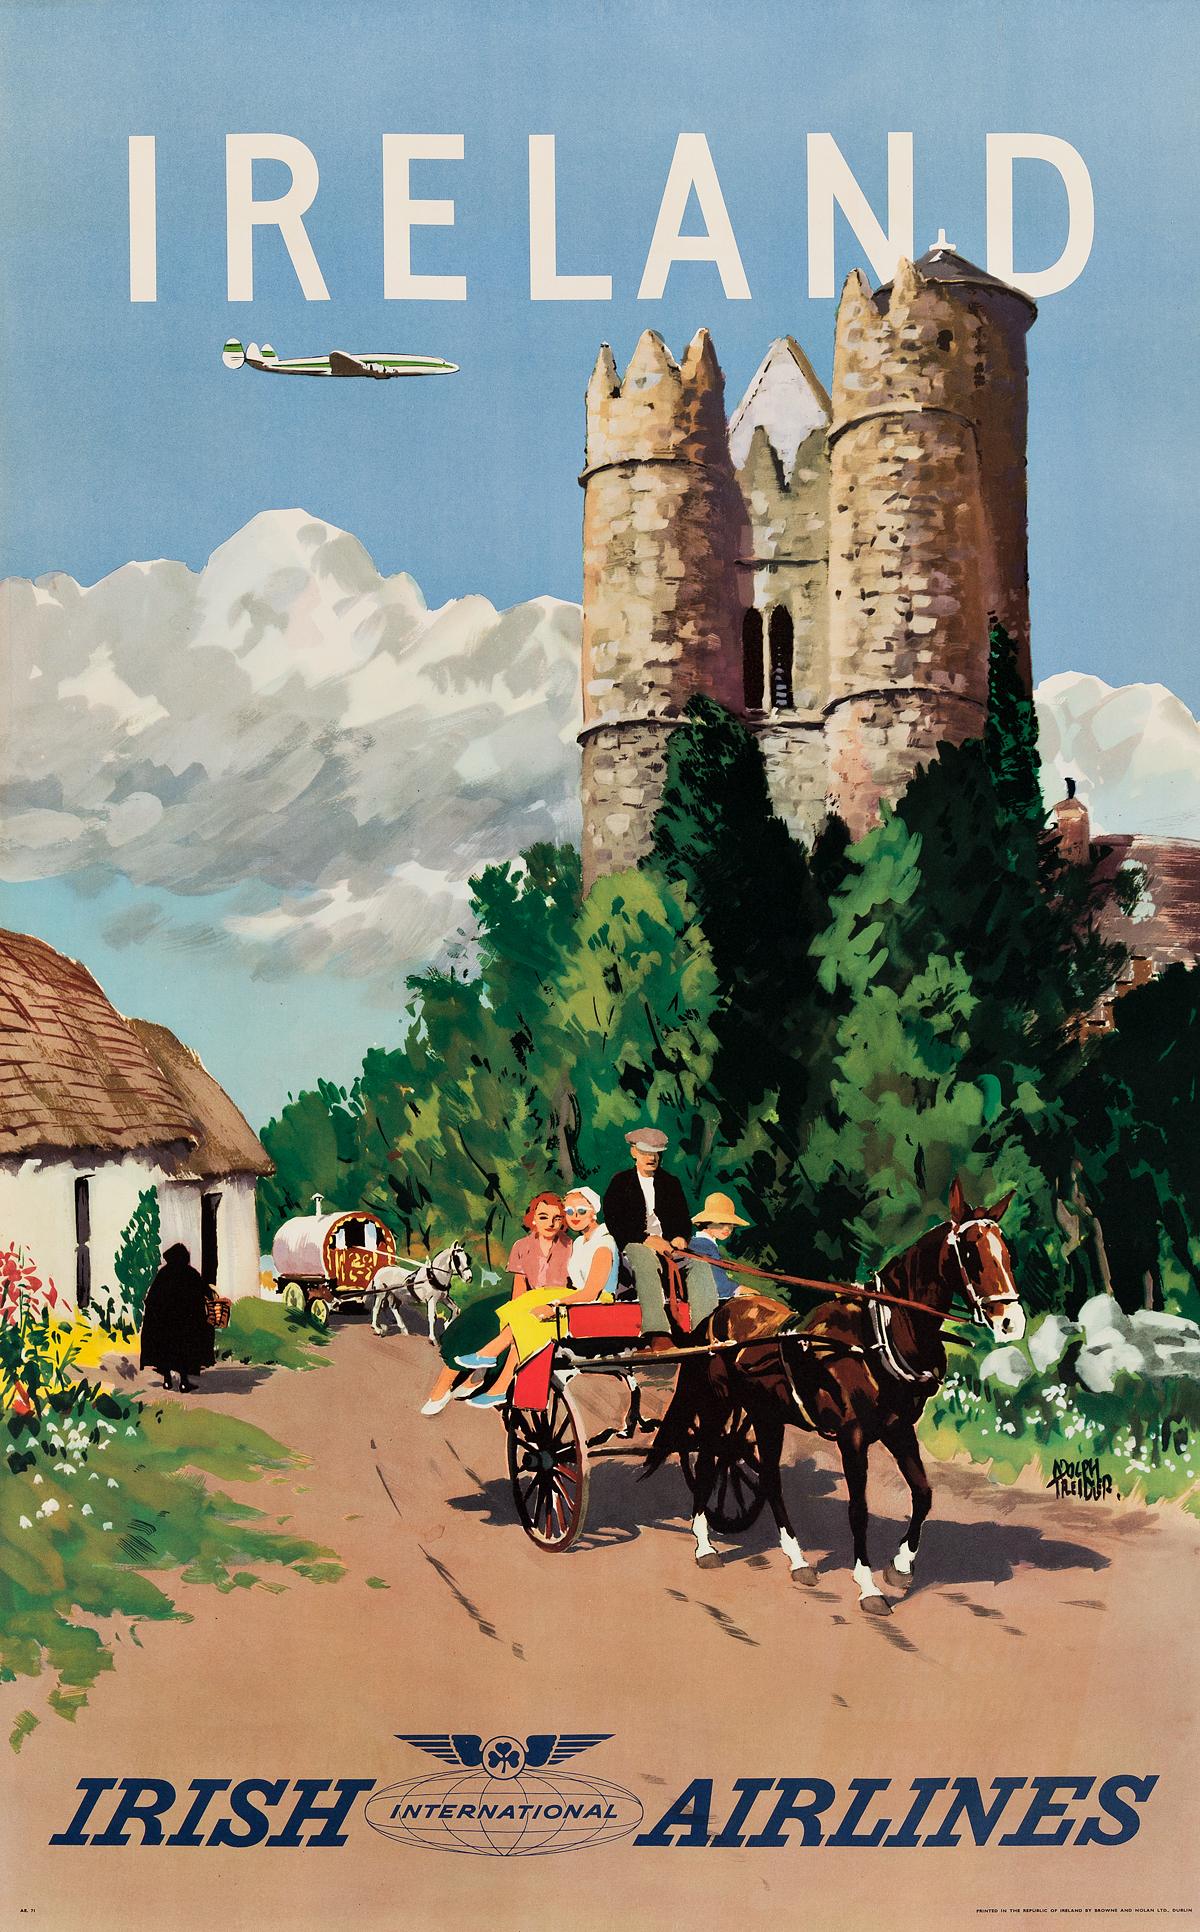 ADOLPH-TREIDLER-(1886-1981)-IRELAND--IRISH-INTERNATIONAL-AIRLINES-Circa-1950s-39x24-inches-101x63-cm-Browne-and-Nolan-Ltd-Dubli